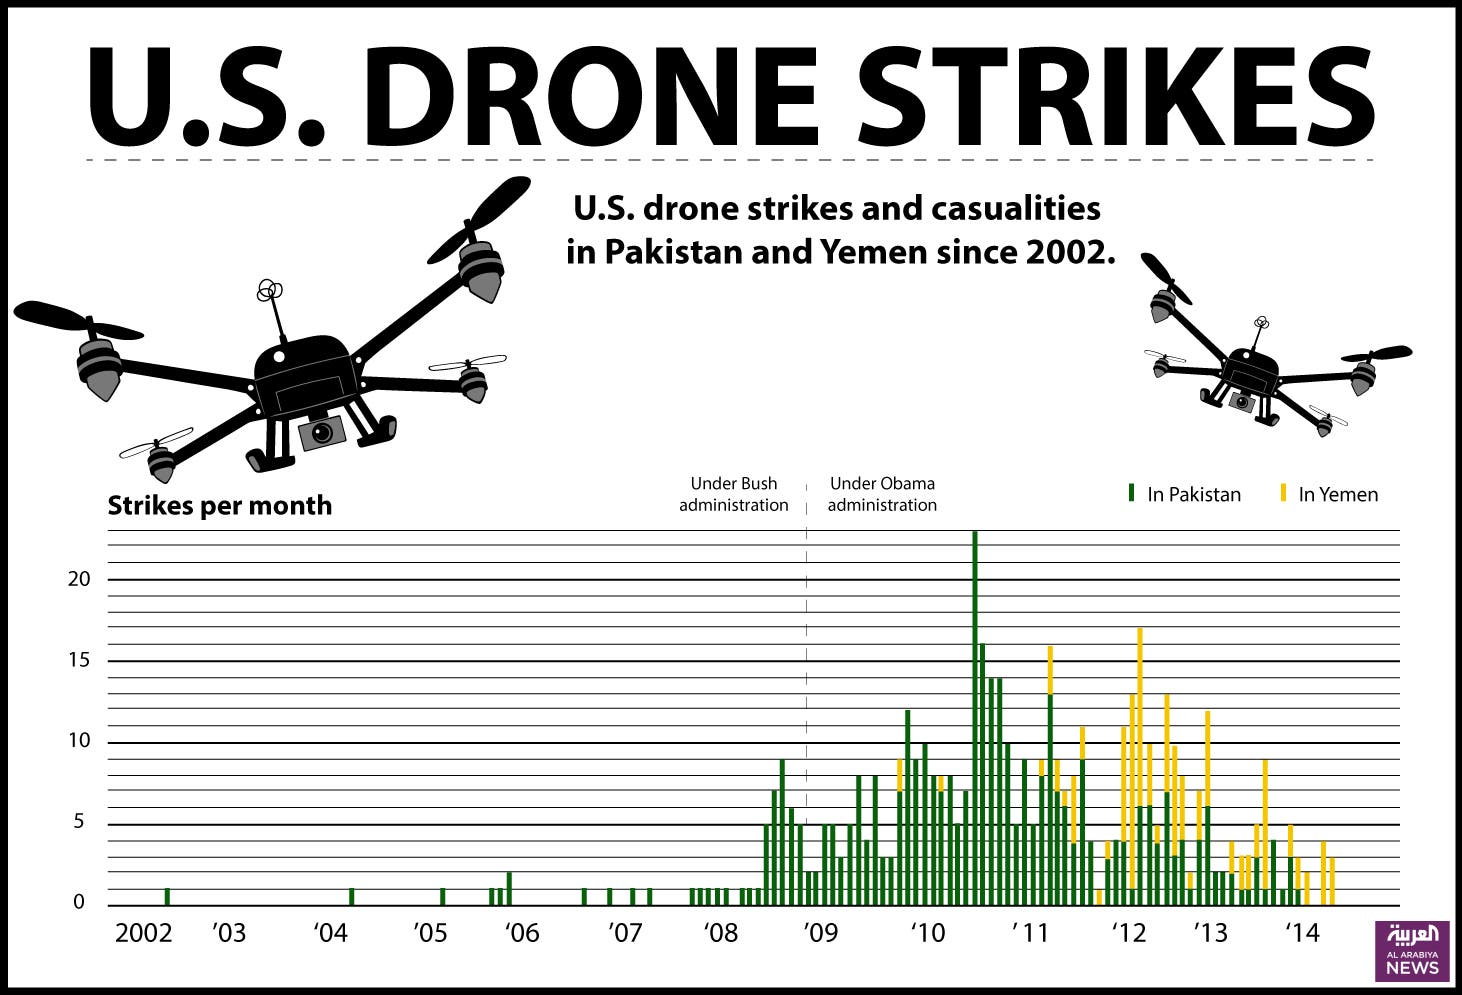 Infographic: U.S. drone strikes